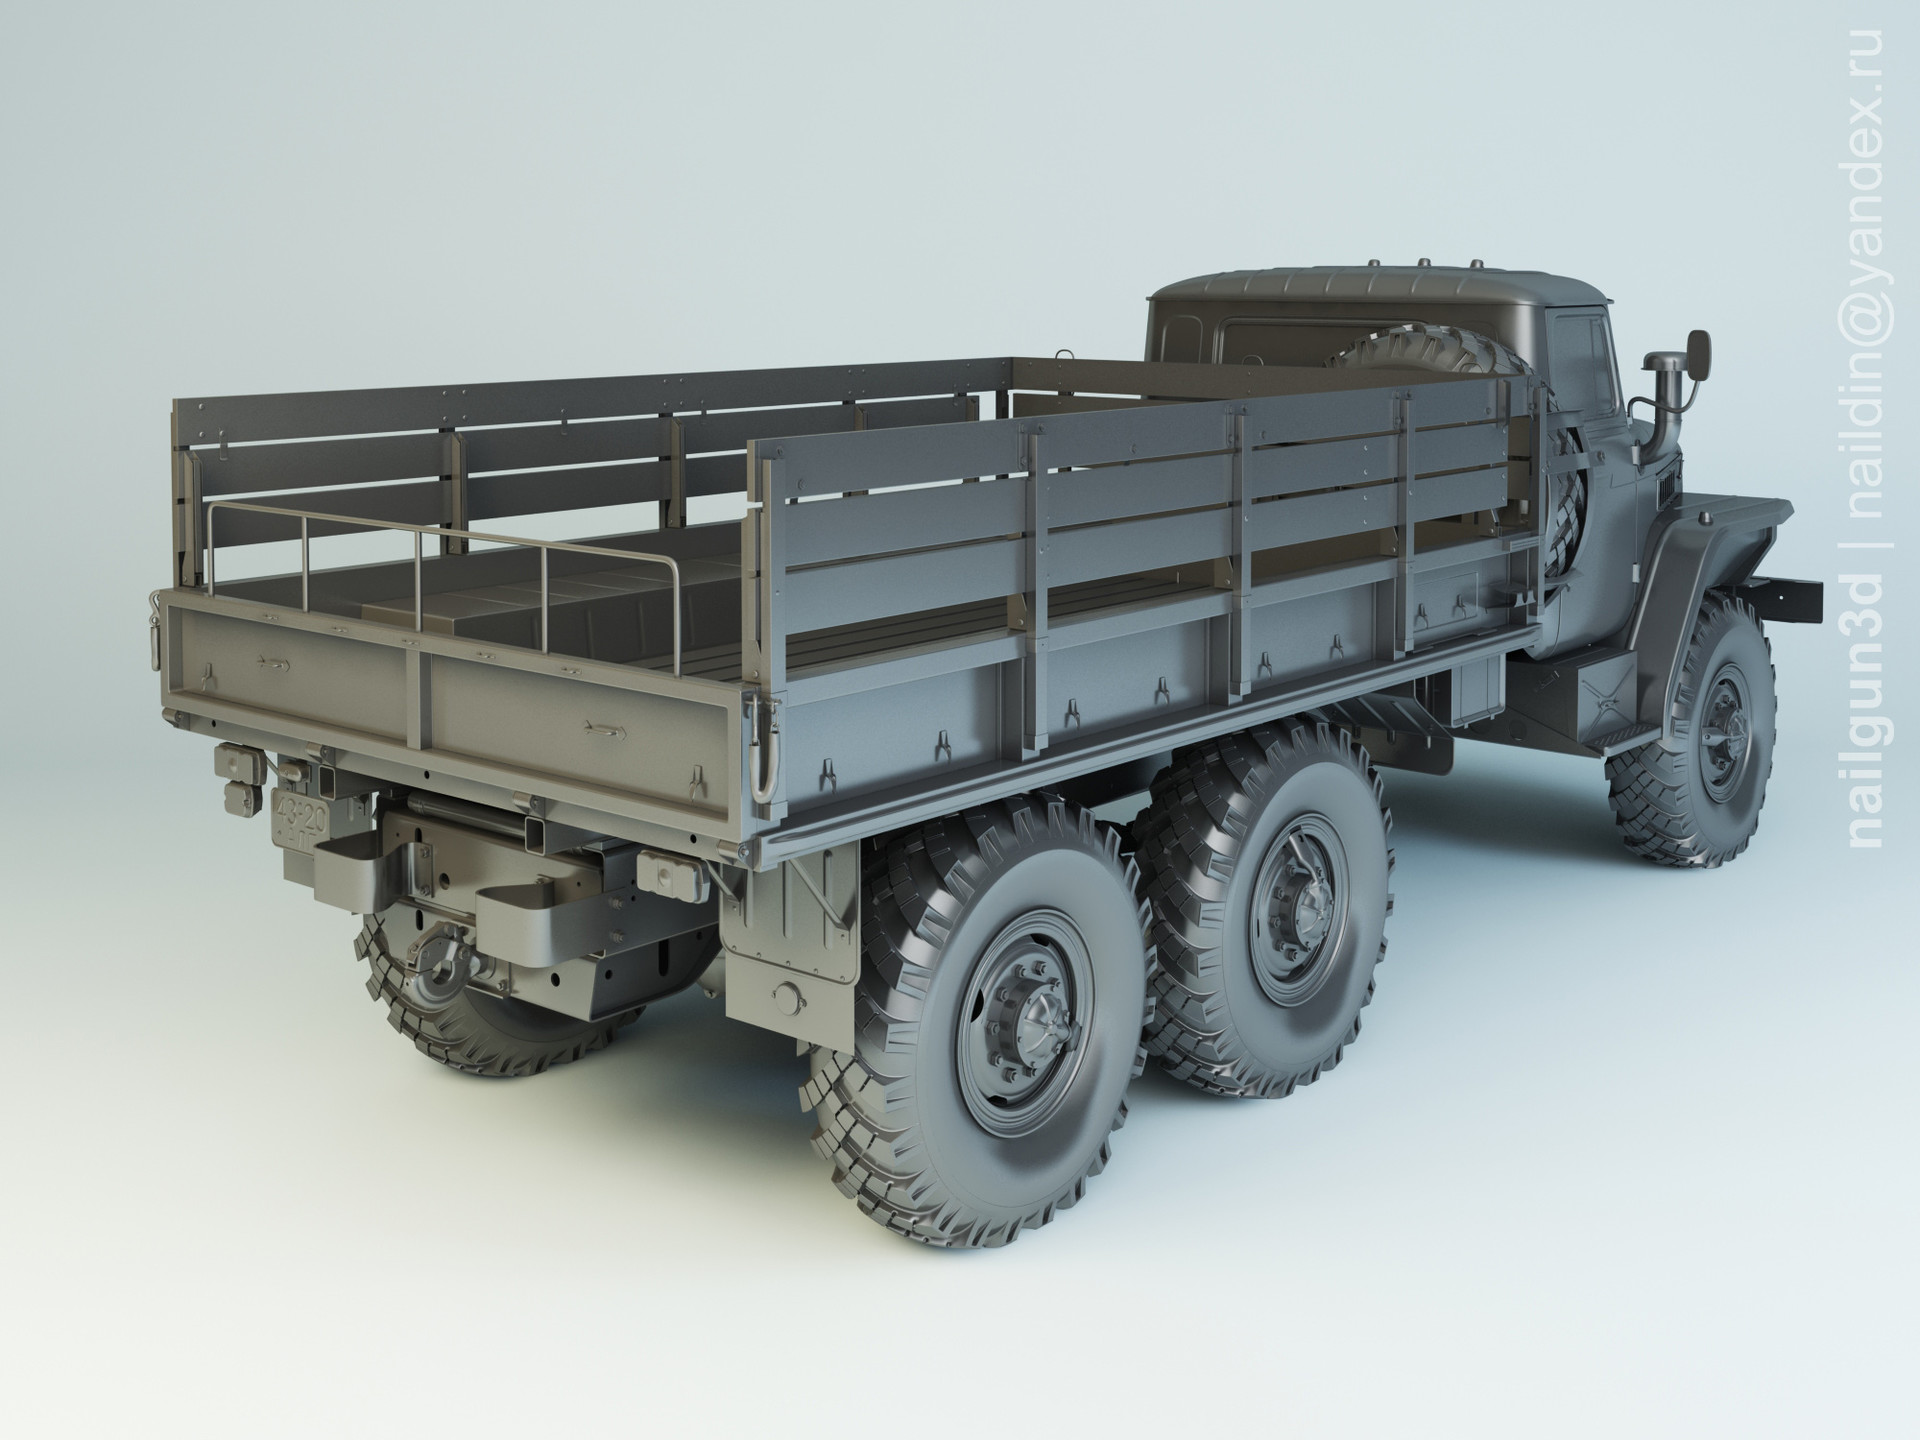 Nail khusnutdinov sal 007 006 ural 4320 modelling 1